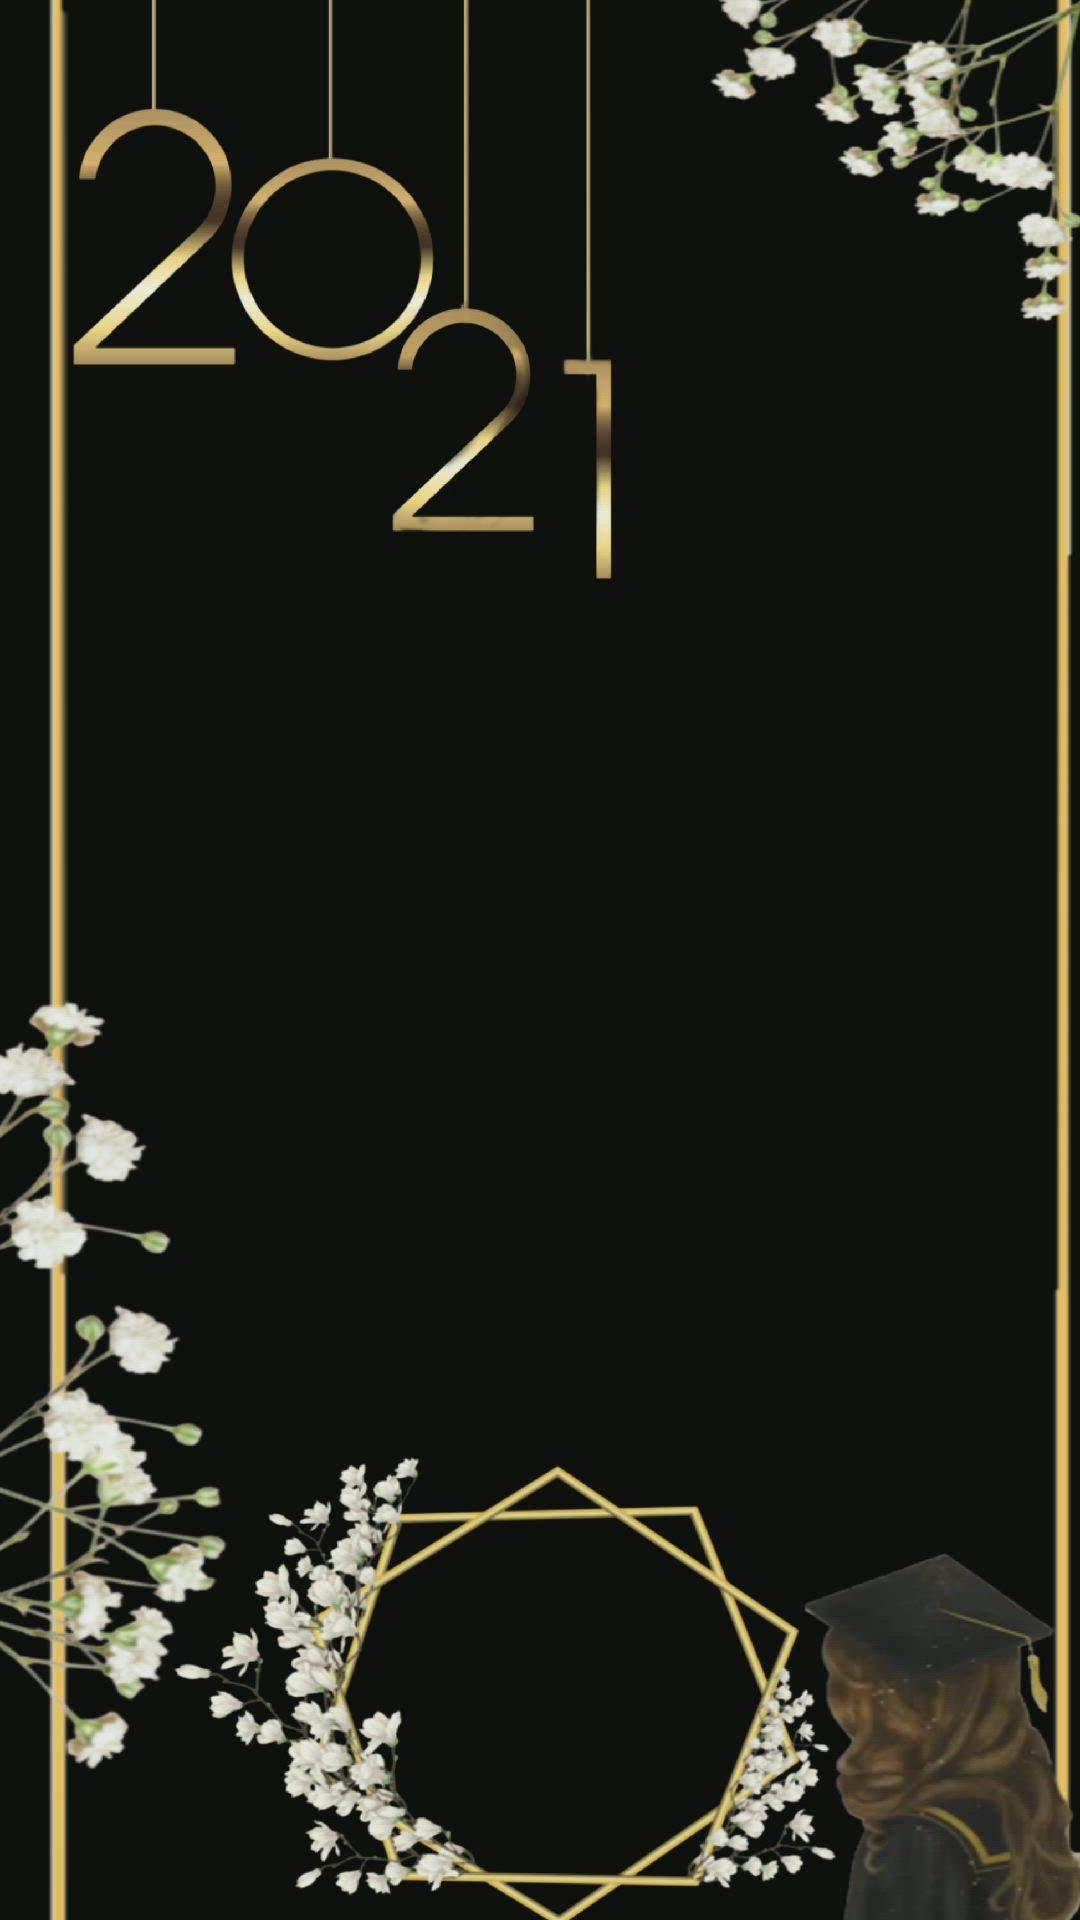 Pin By Ohood On اطارات بشارة للتصميم Video In 2021 Flower Graphic Design Flower Background Wallpaper Flower Iphone Wallpaper